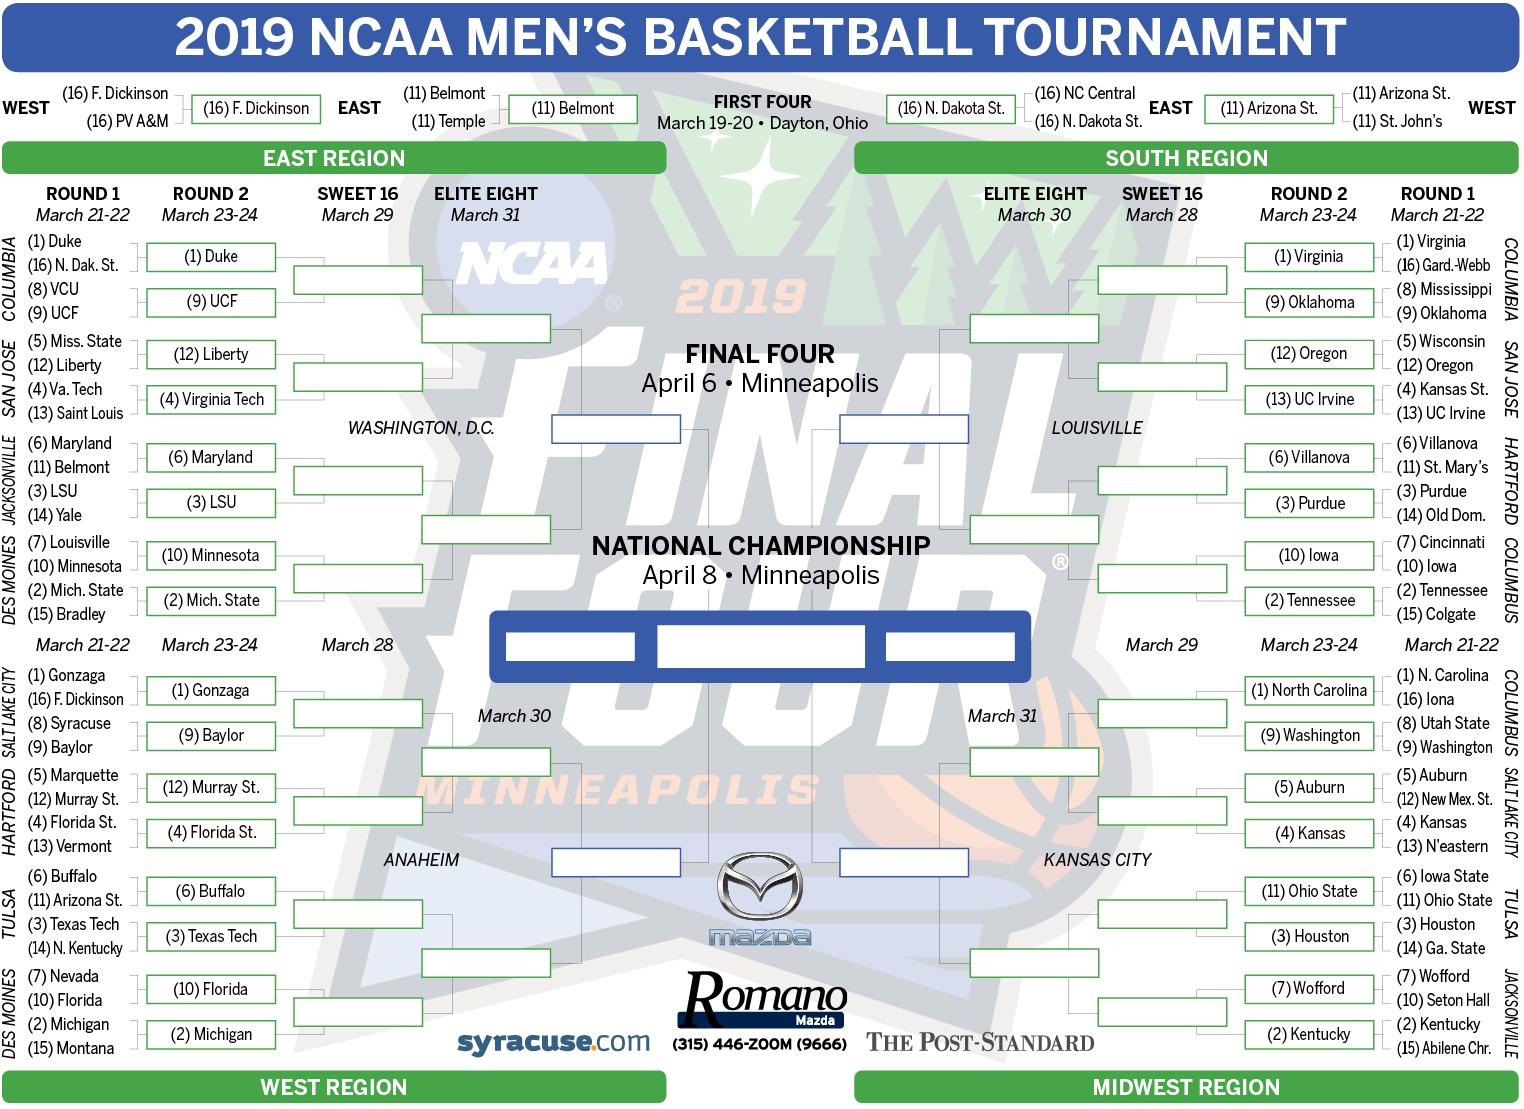 2019 NCAA Men's Basketball Tournament Bracket